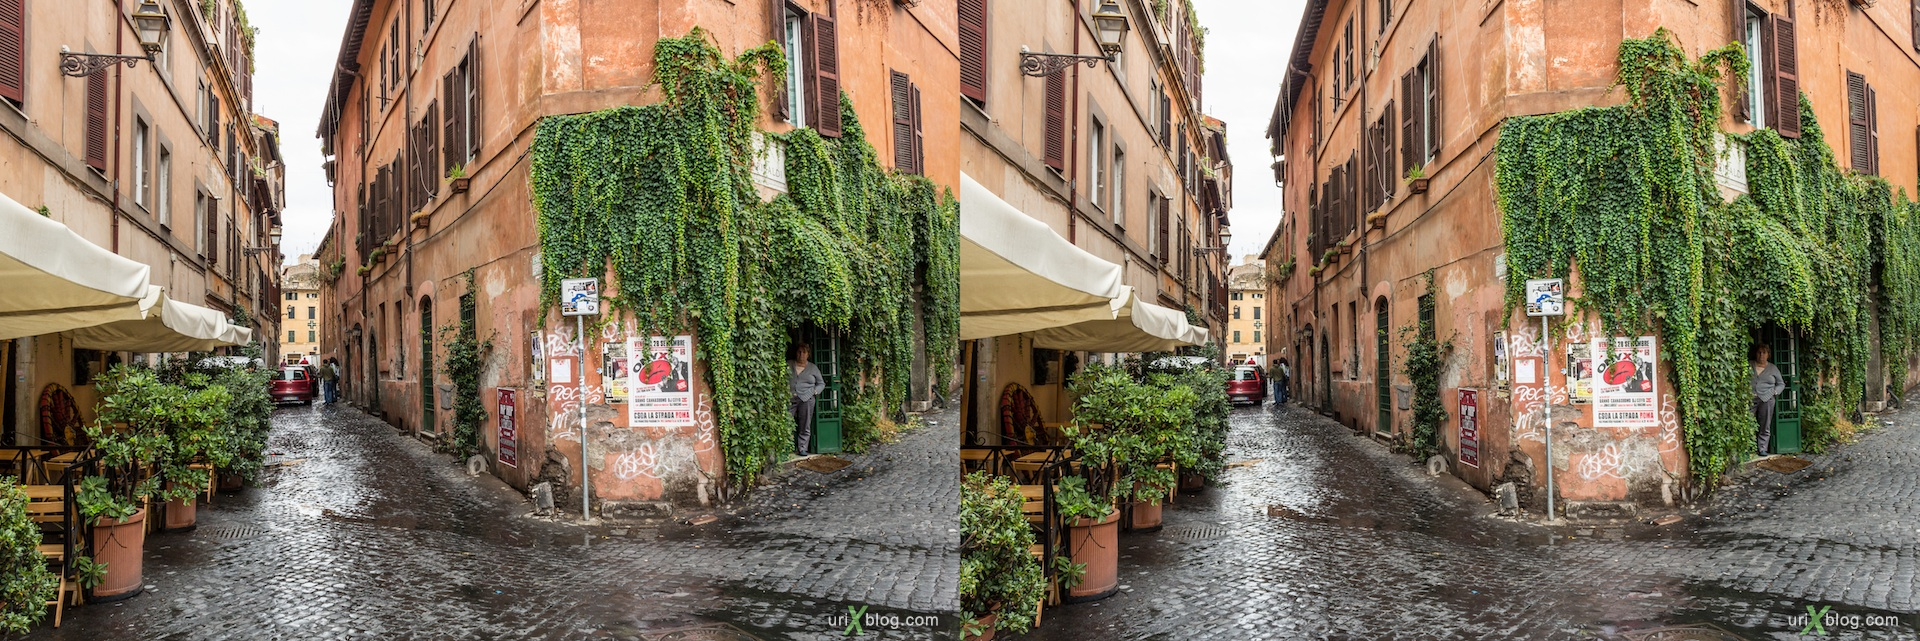 2012, via Garibaldi street, via della Scala street, corner, Rome, Italy, Europe, 3D, stereo pair, cross-eyed, crossview, cross view stereo pair